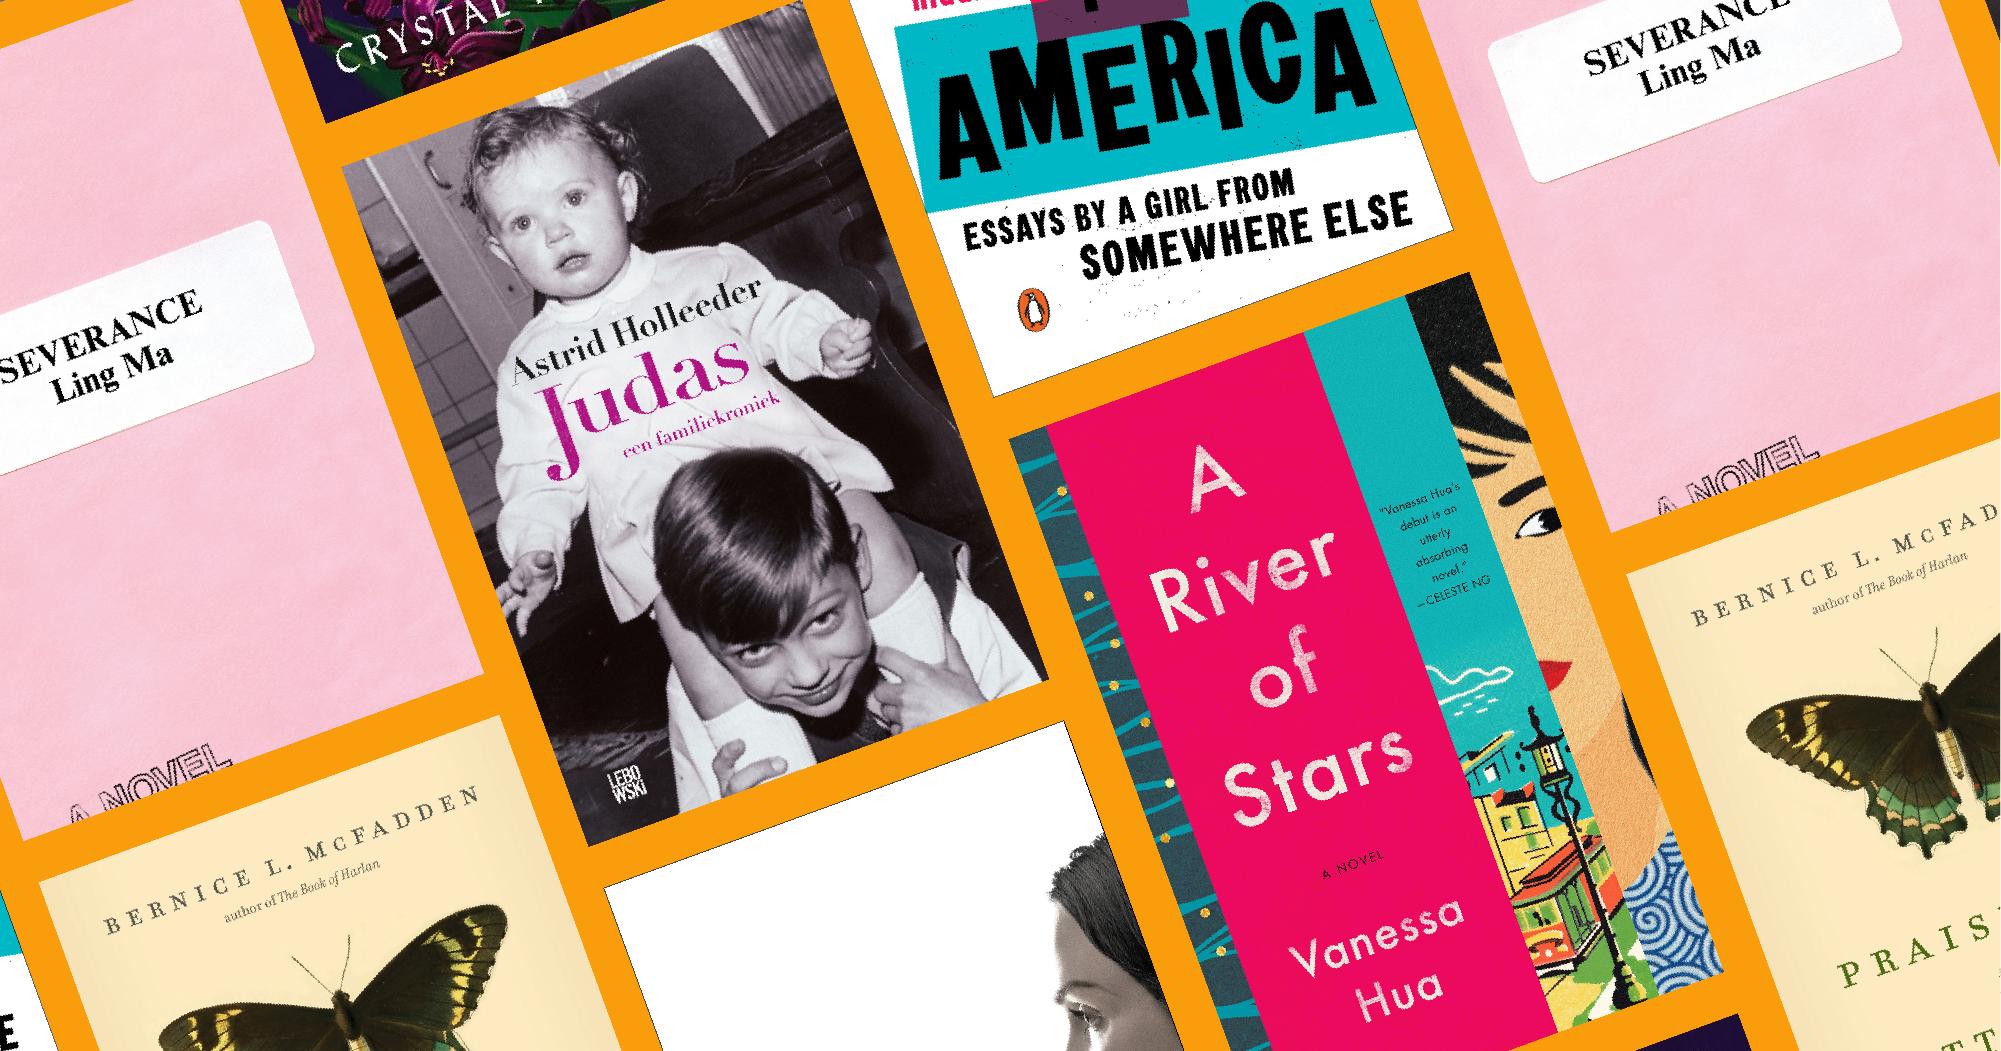 Best New Books August 2018, Fiction, Romance & More